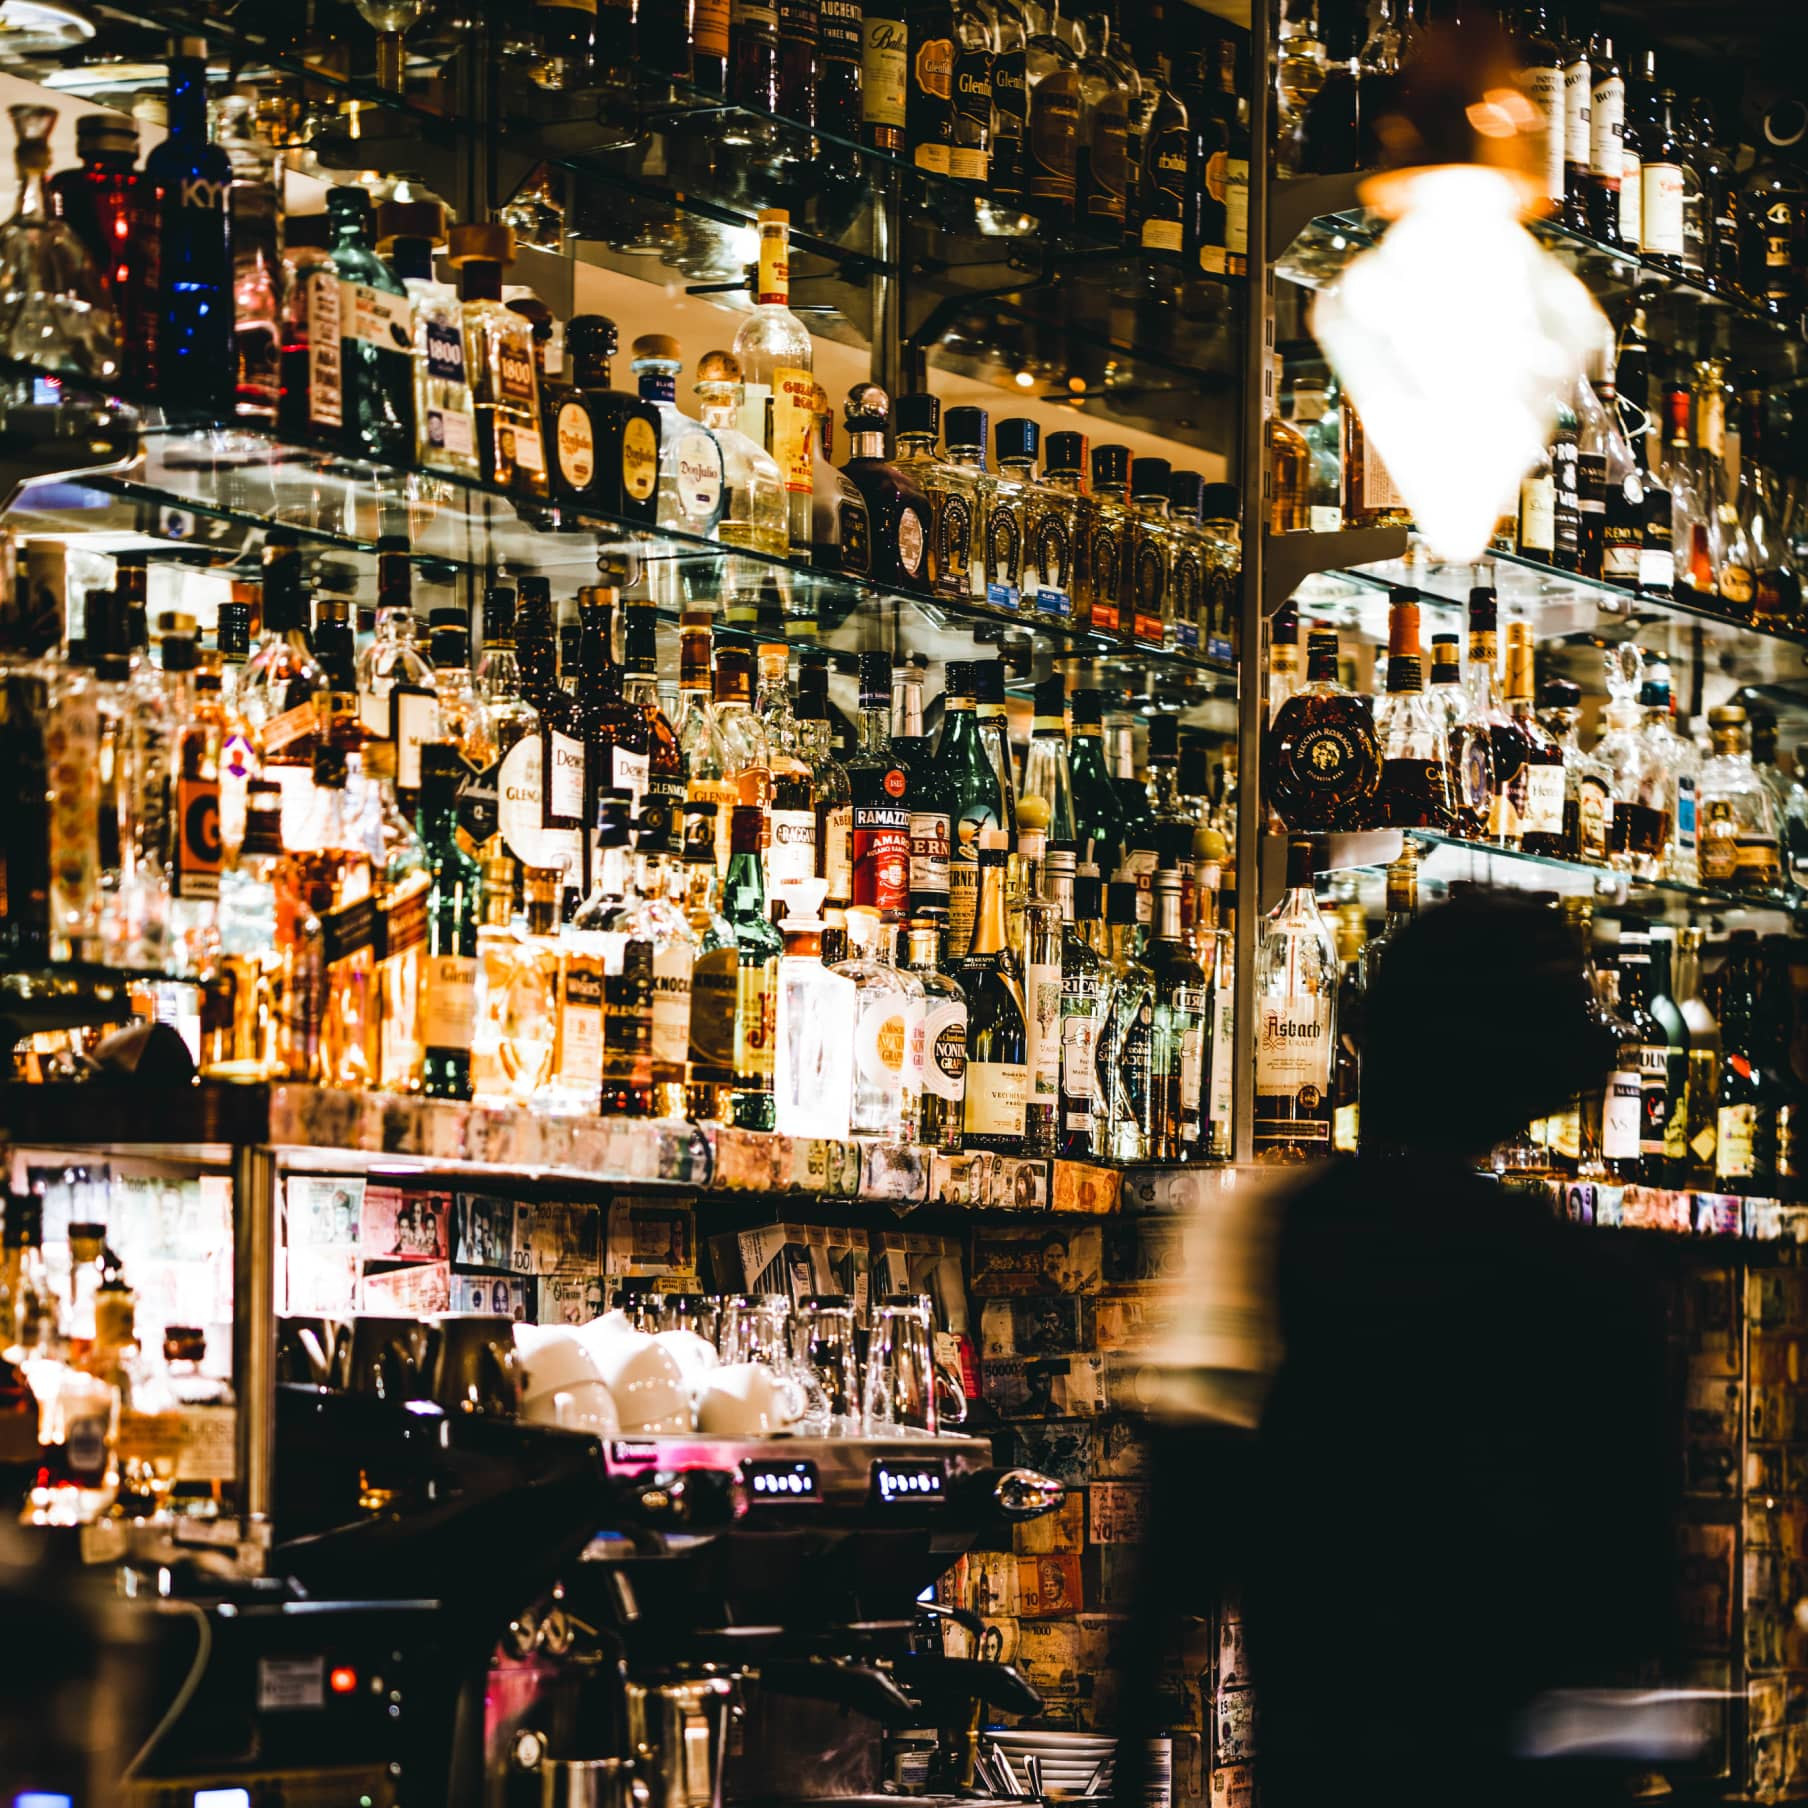 Bar mit Barkeeper im Kakadus Frankfurt